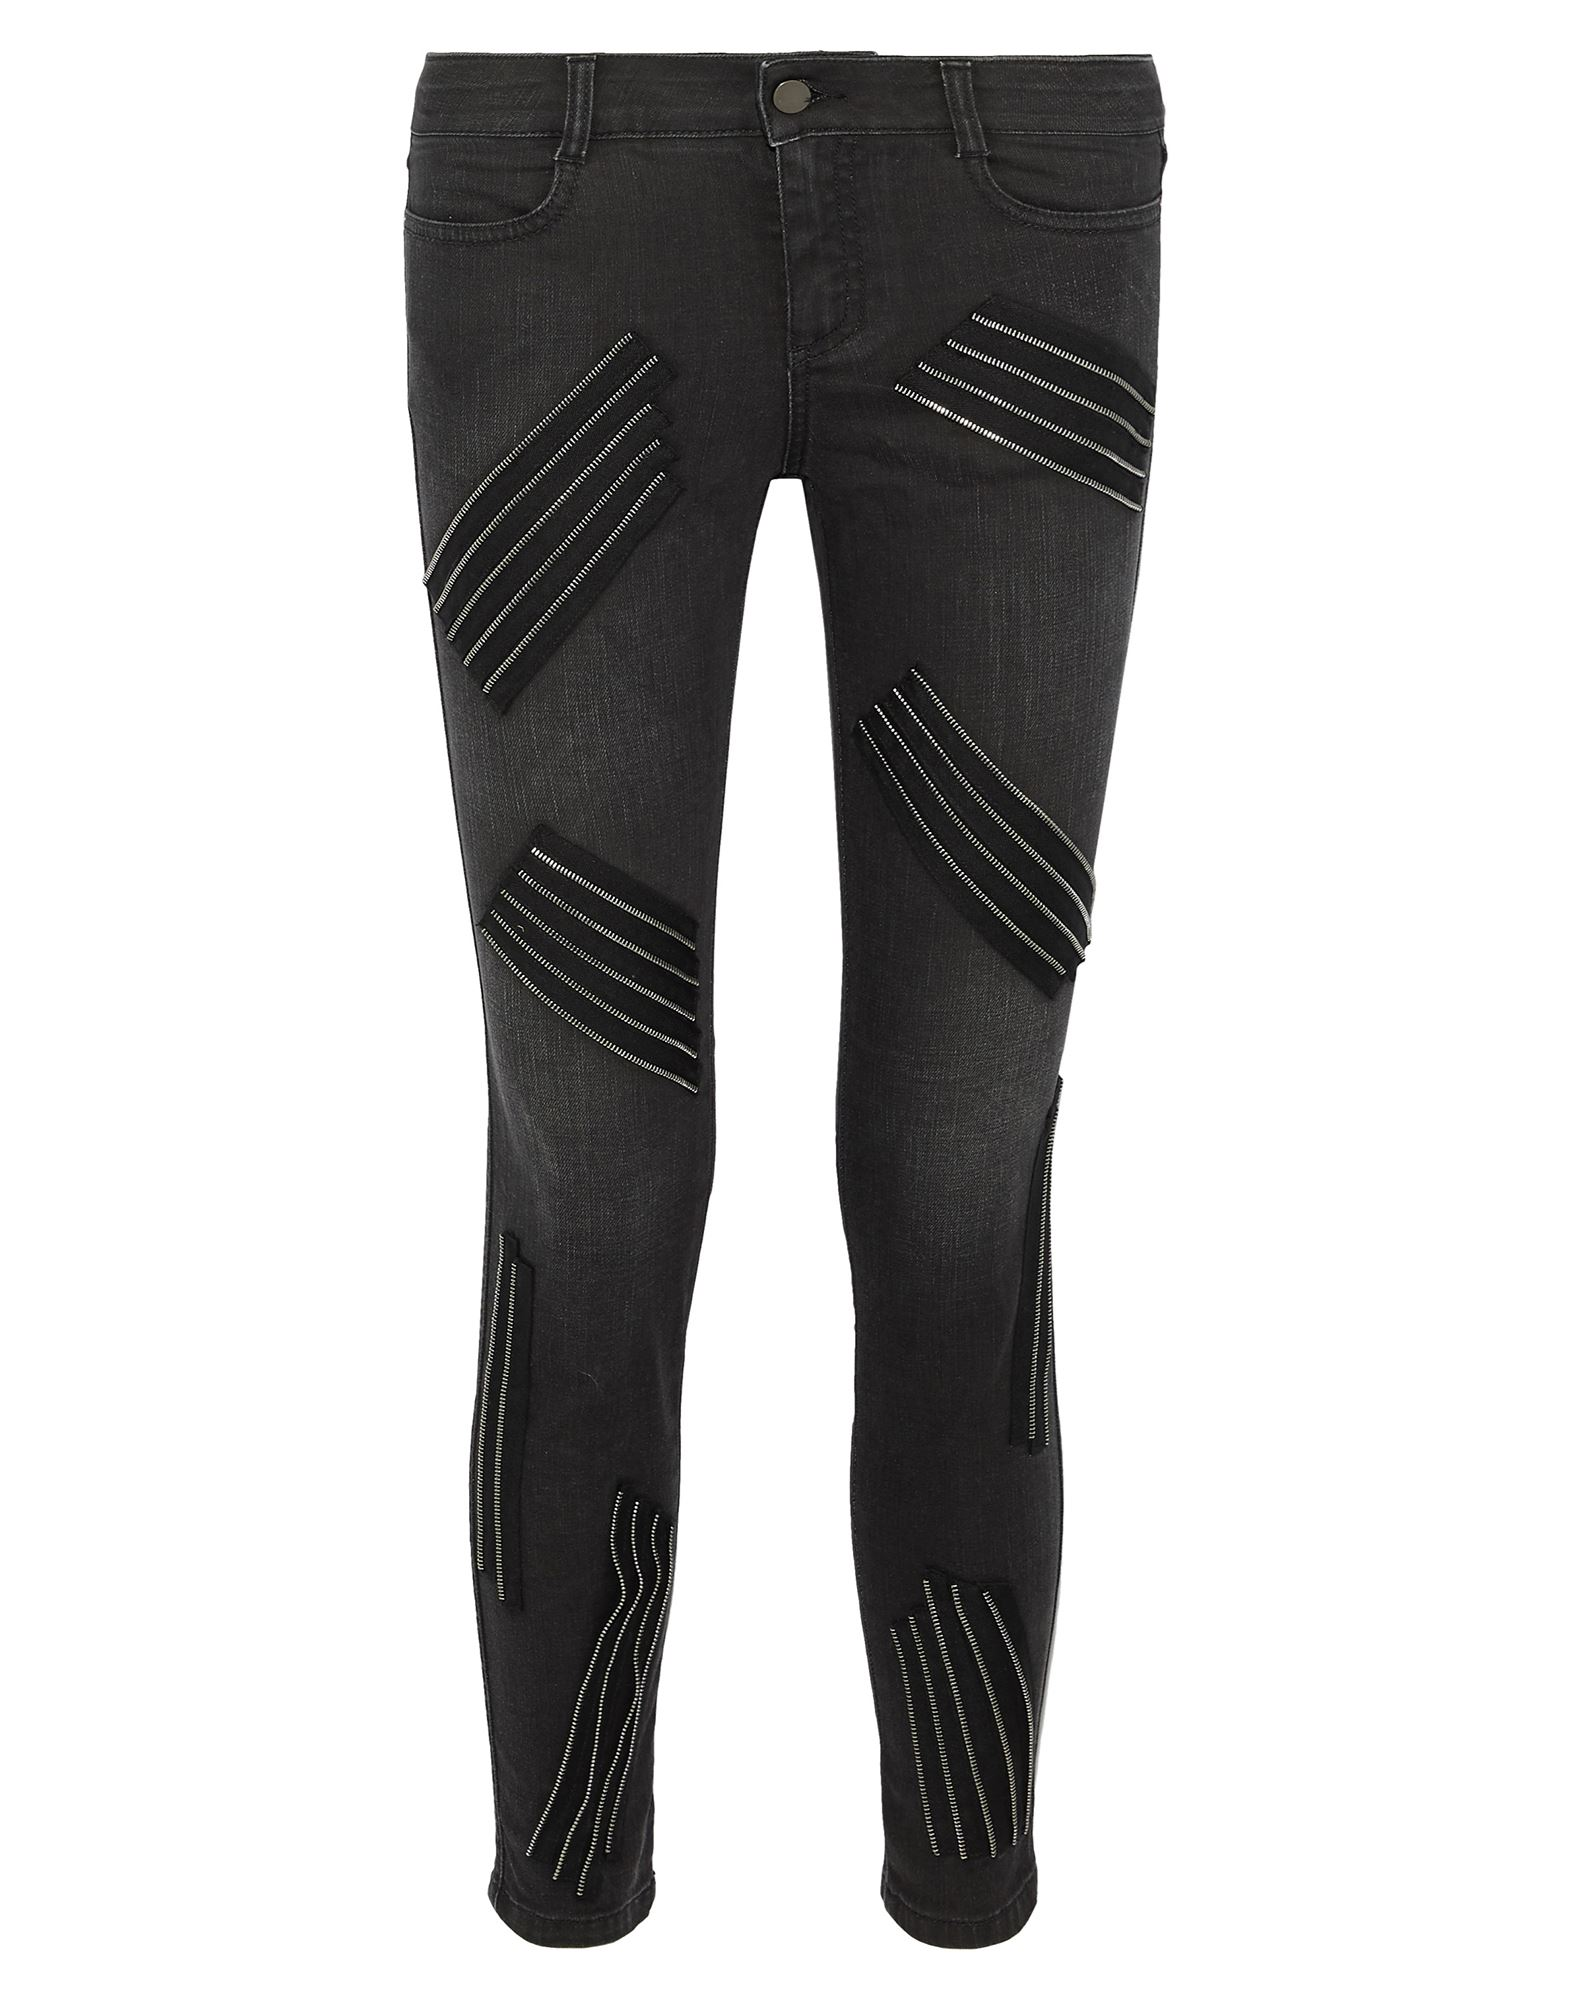 Pantaloni Jeans Stella Mccartney Donna - Acquista online su mb81Ef0bG